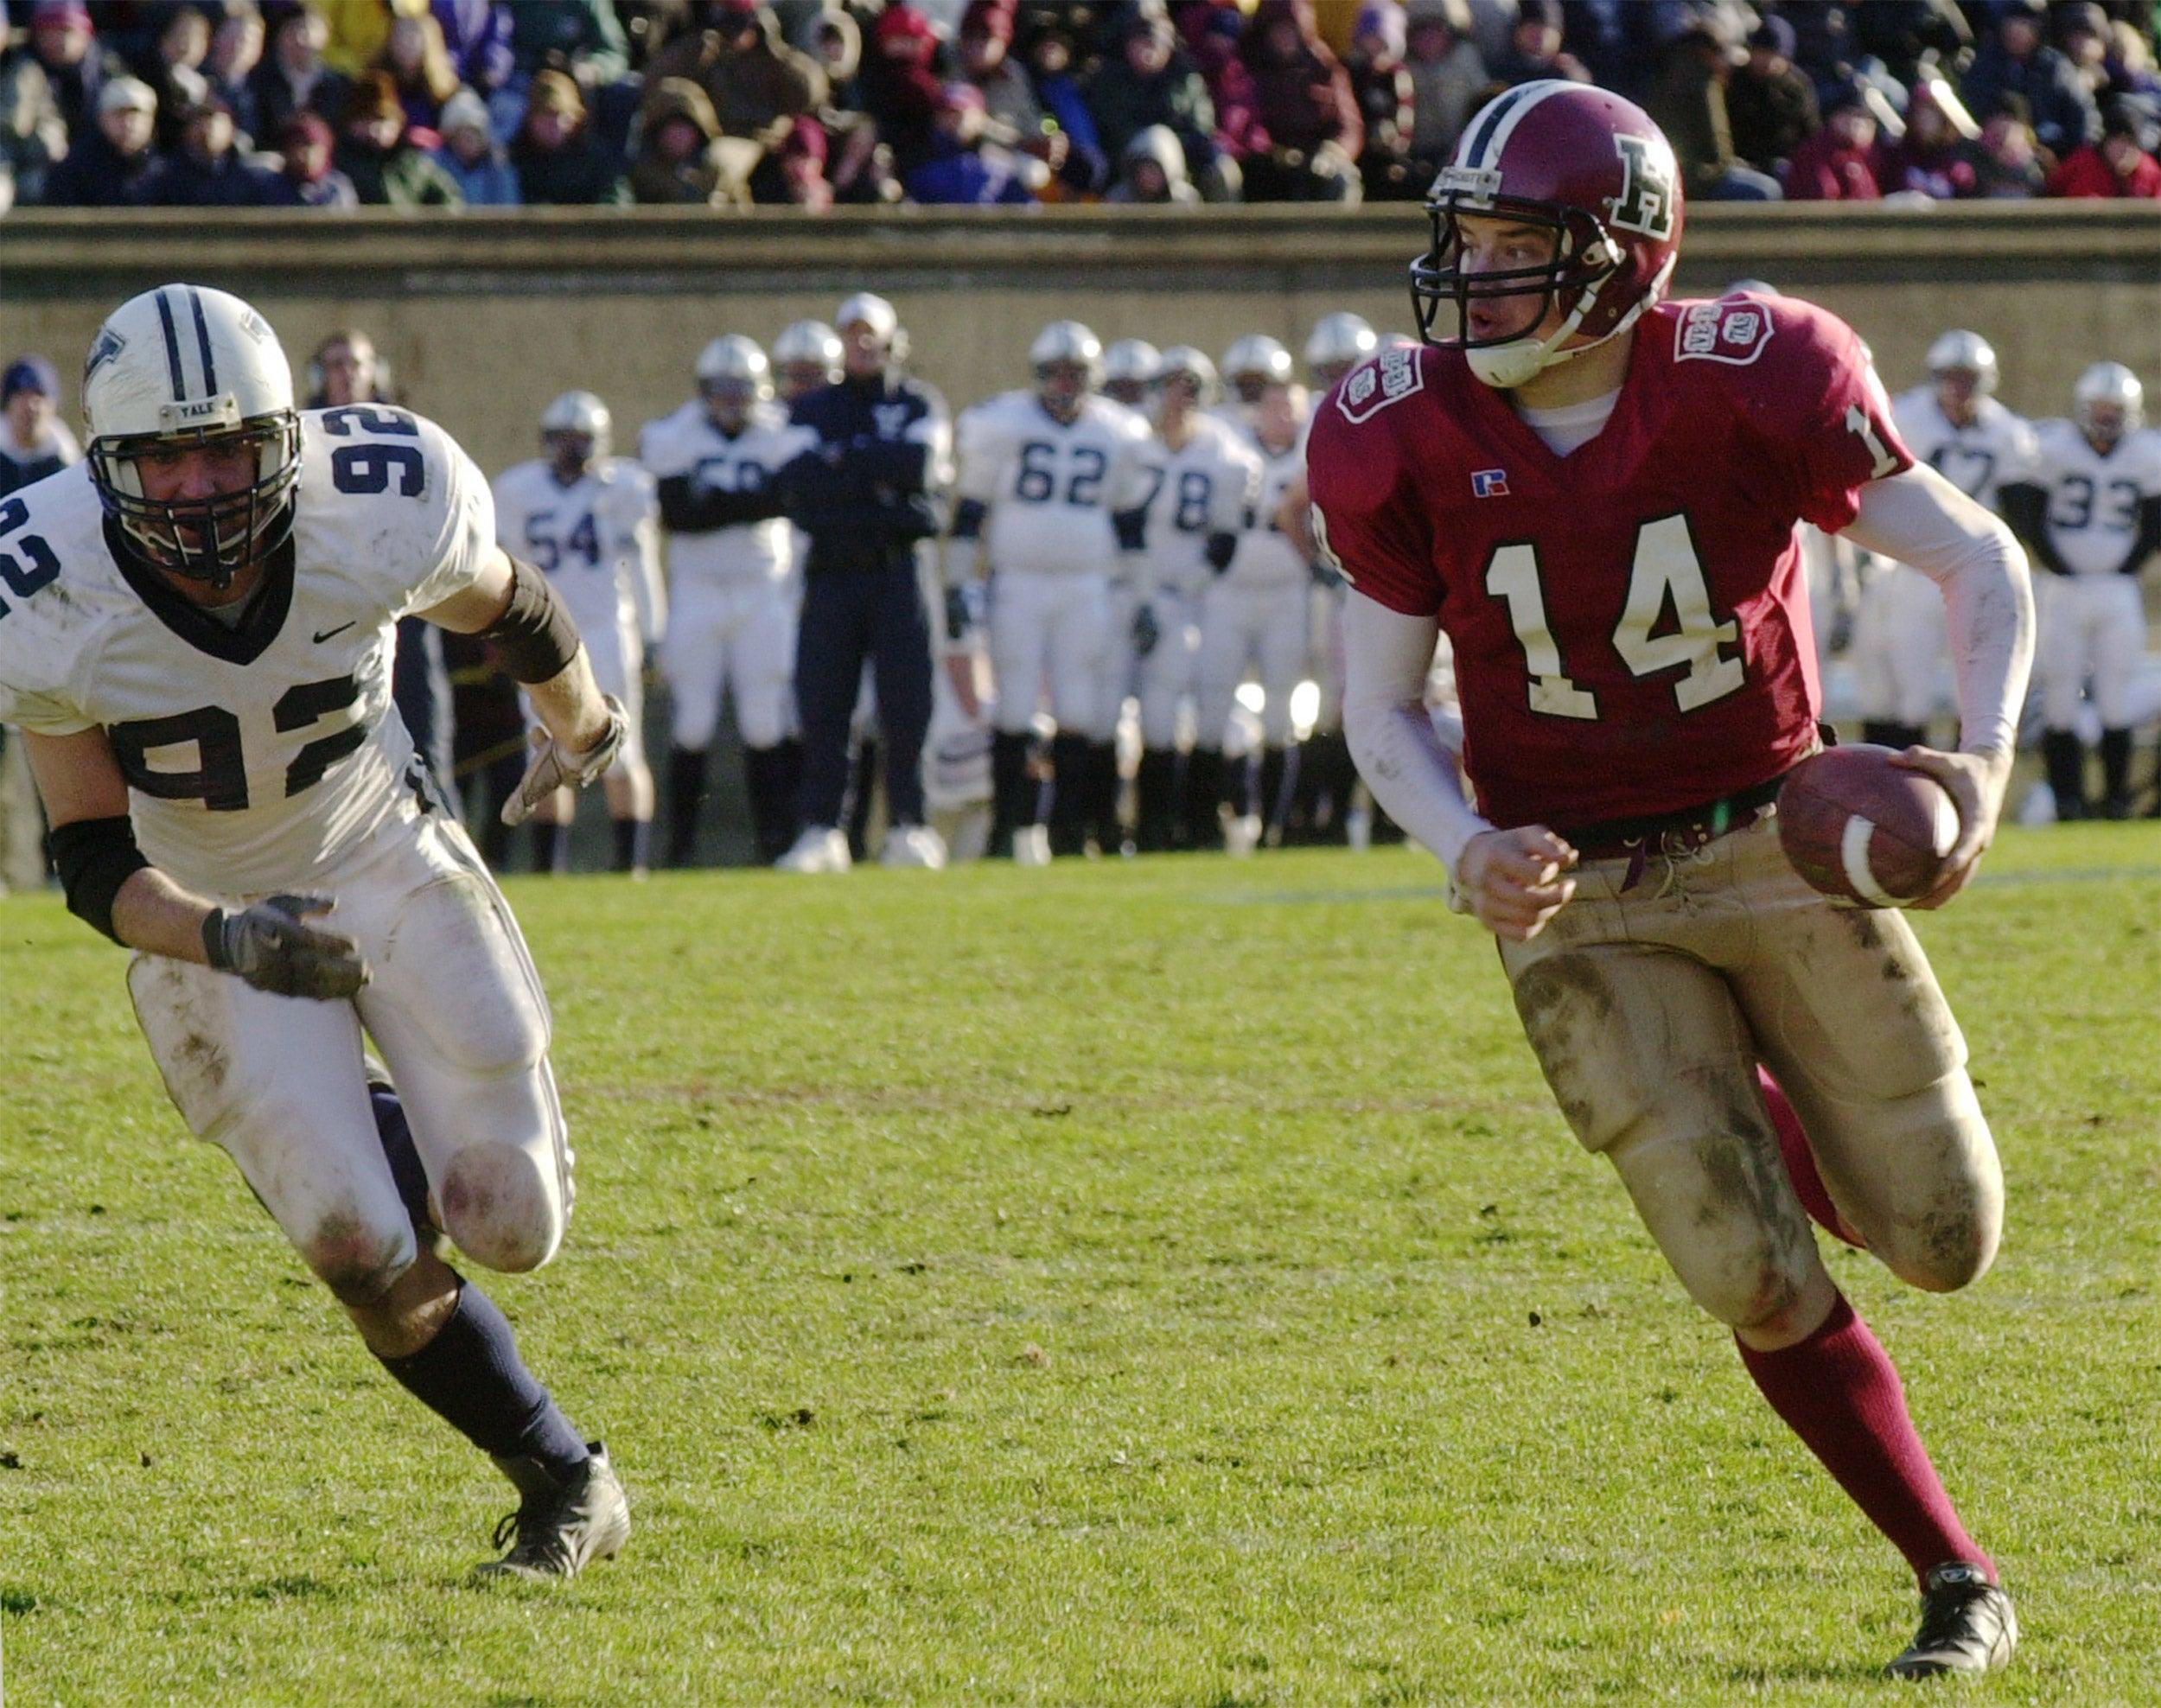 Harvard quarterback Ryan Fitzpatrick